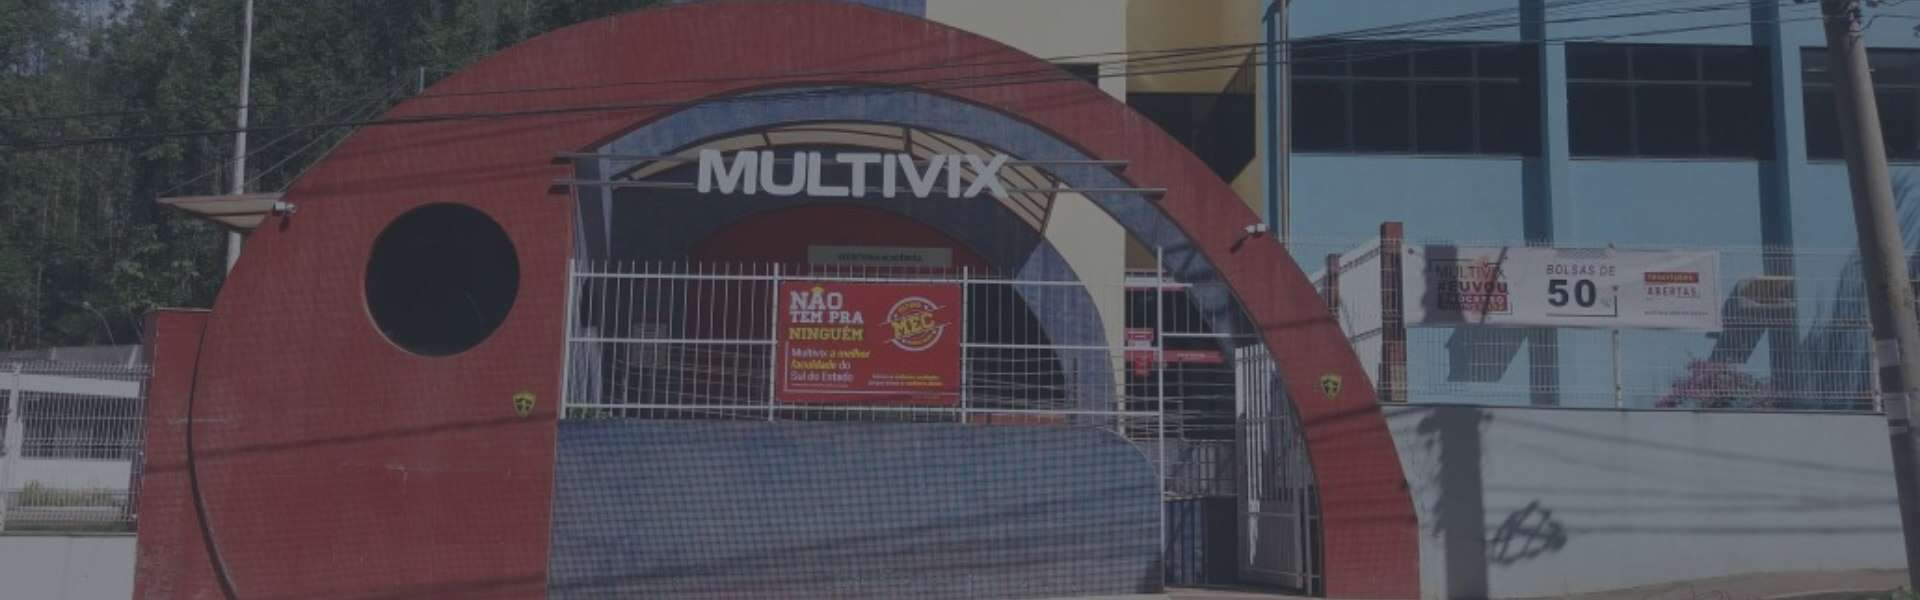 Multivix Castelo